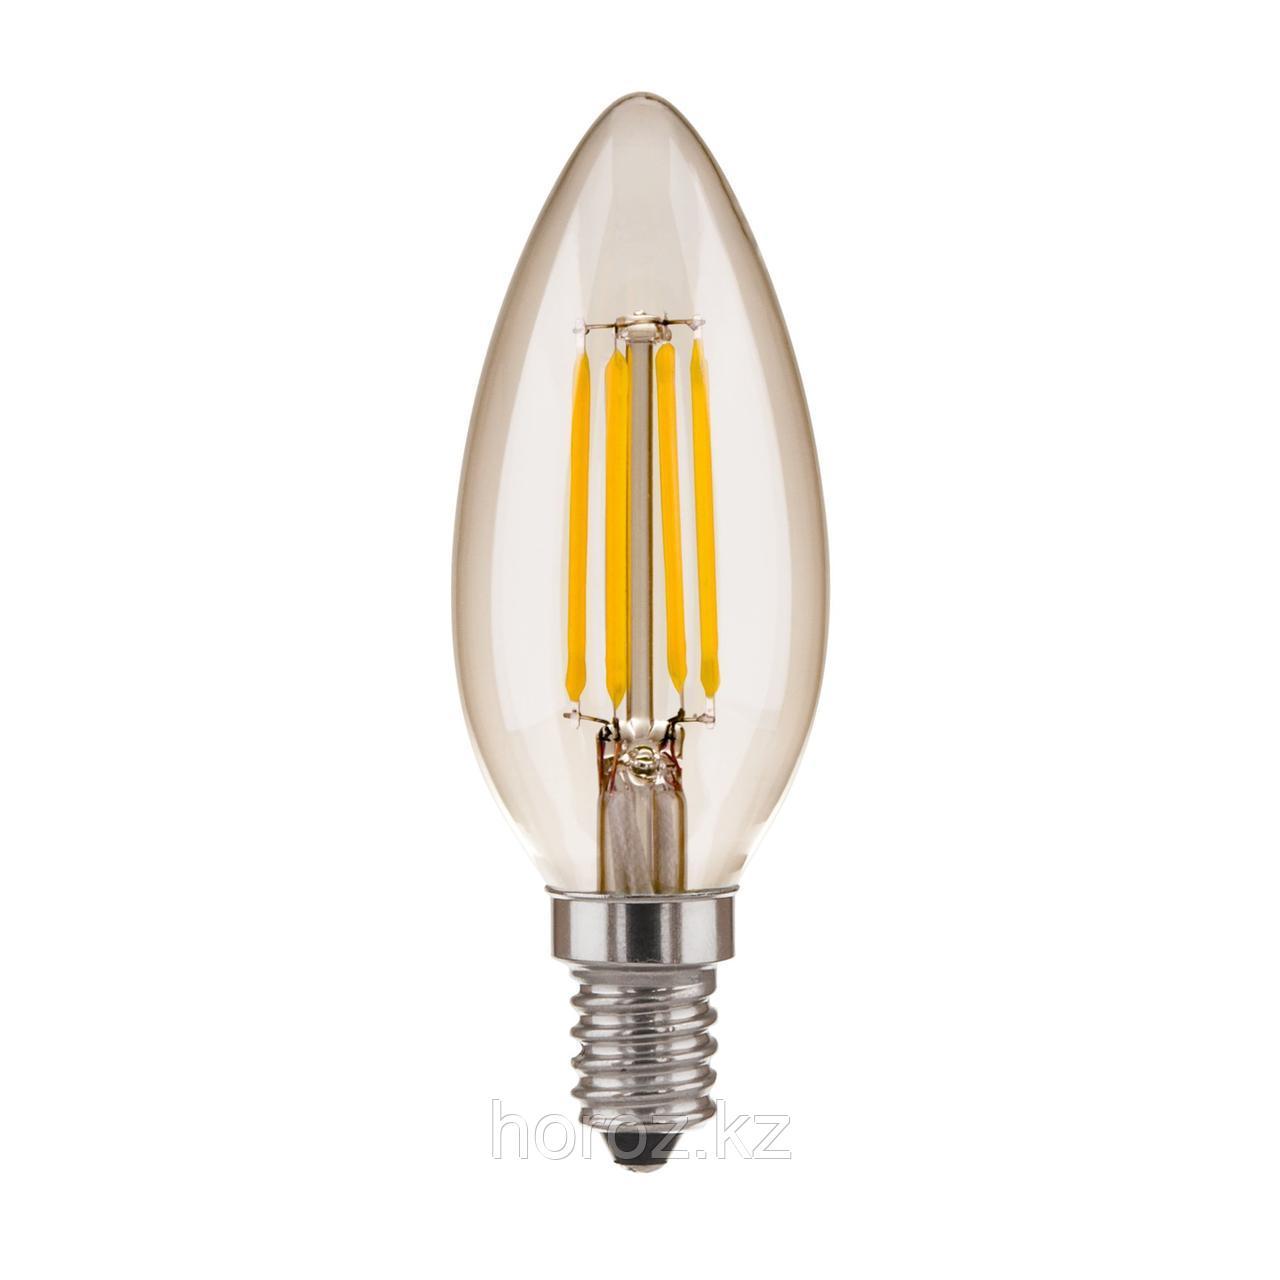 Филаментная лампа свеча 6 Ватт E14